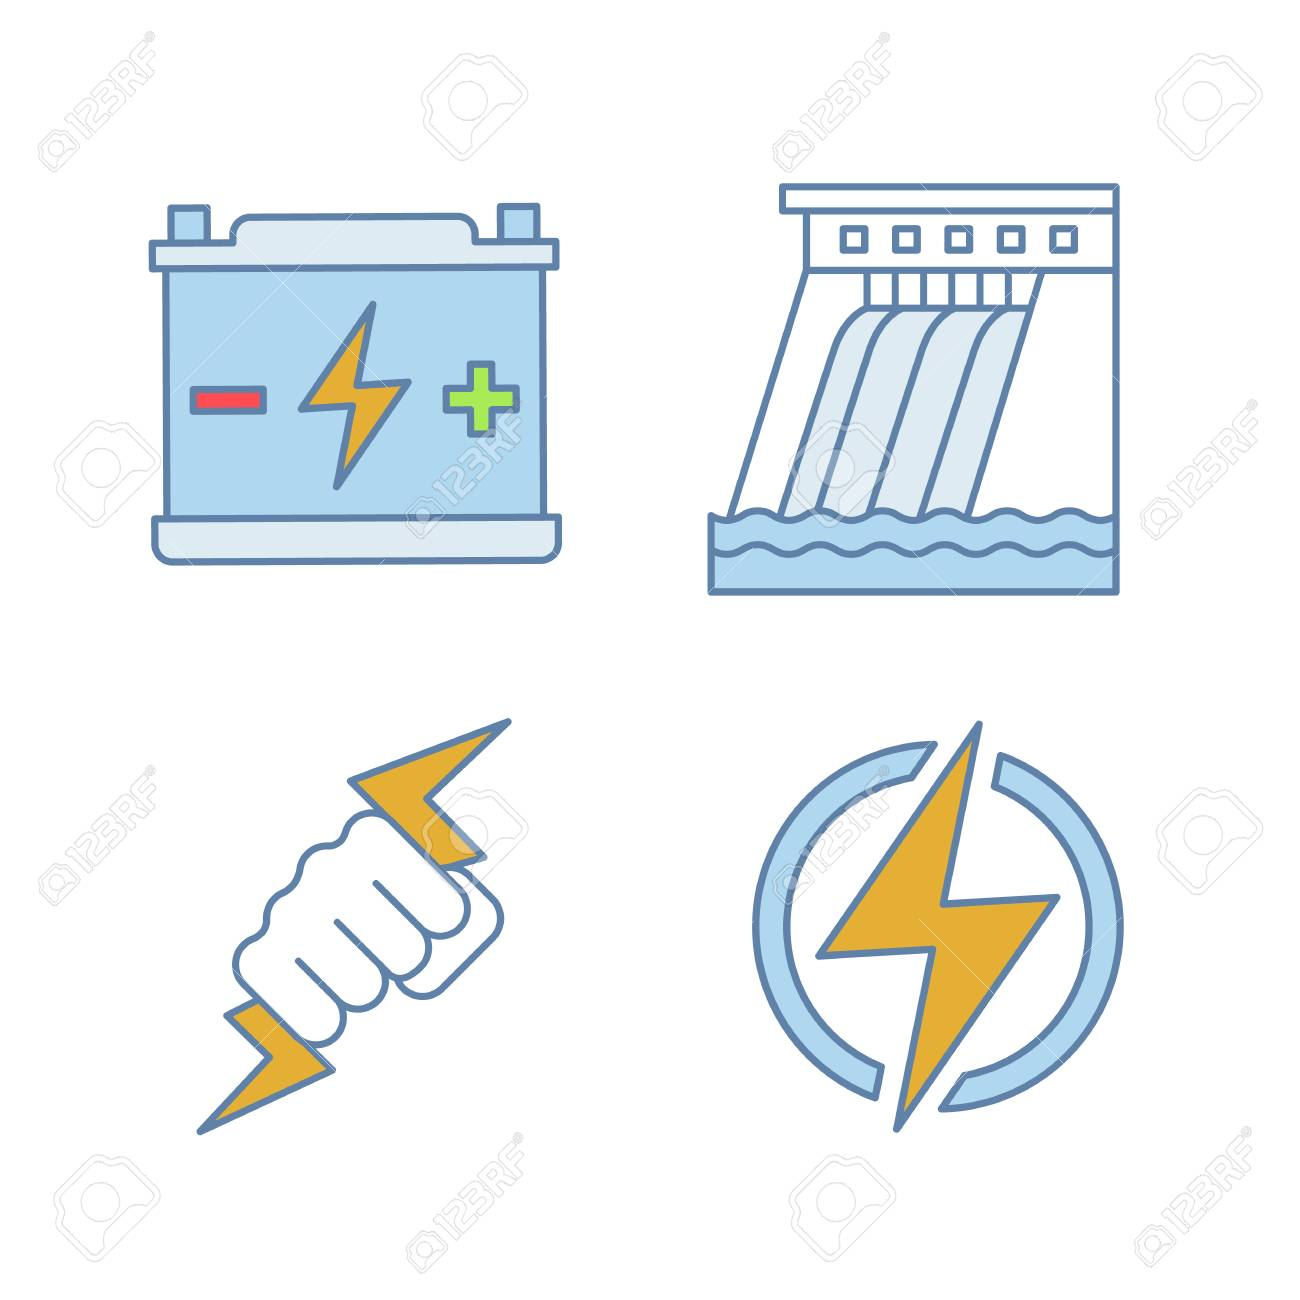 hight resolution of accumulator hydroelectric dam power fist lightning bolt